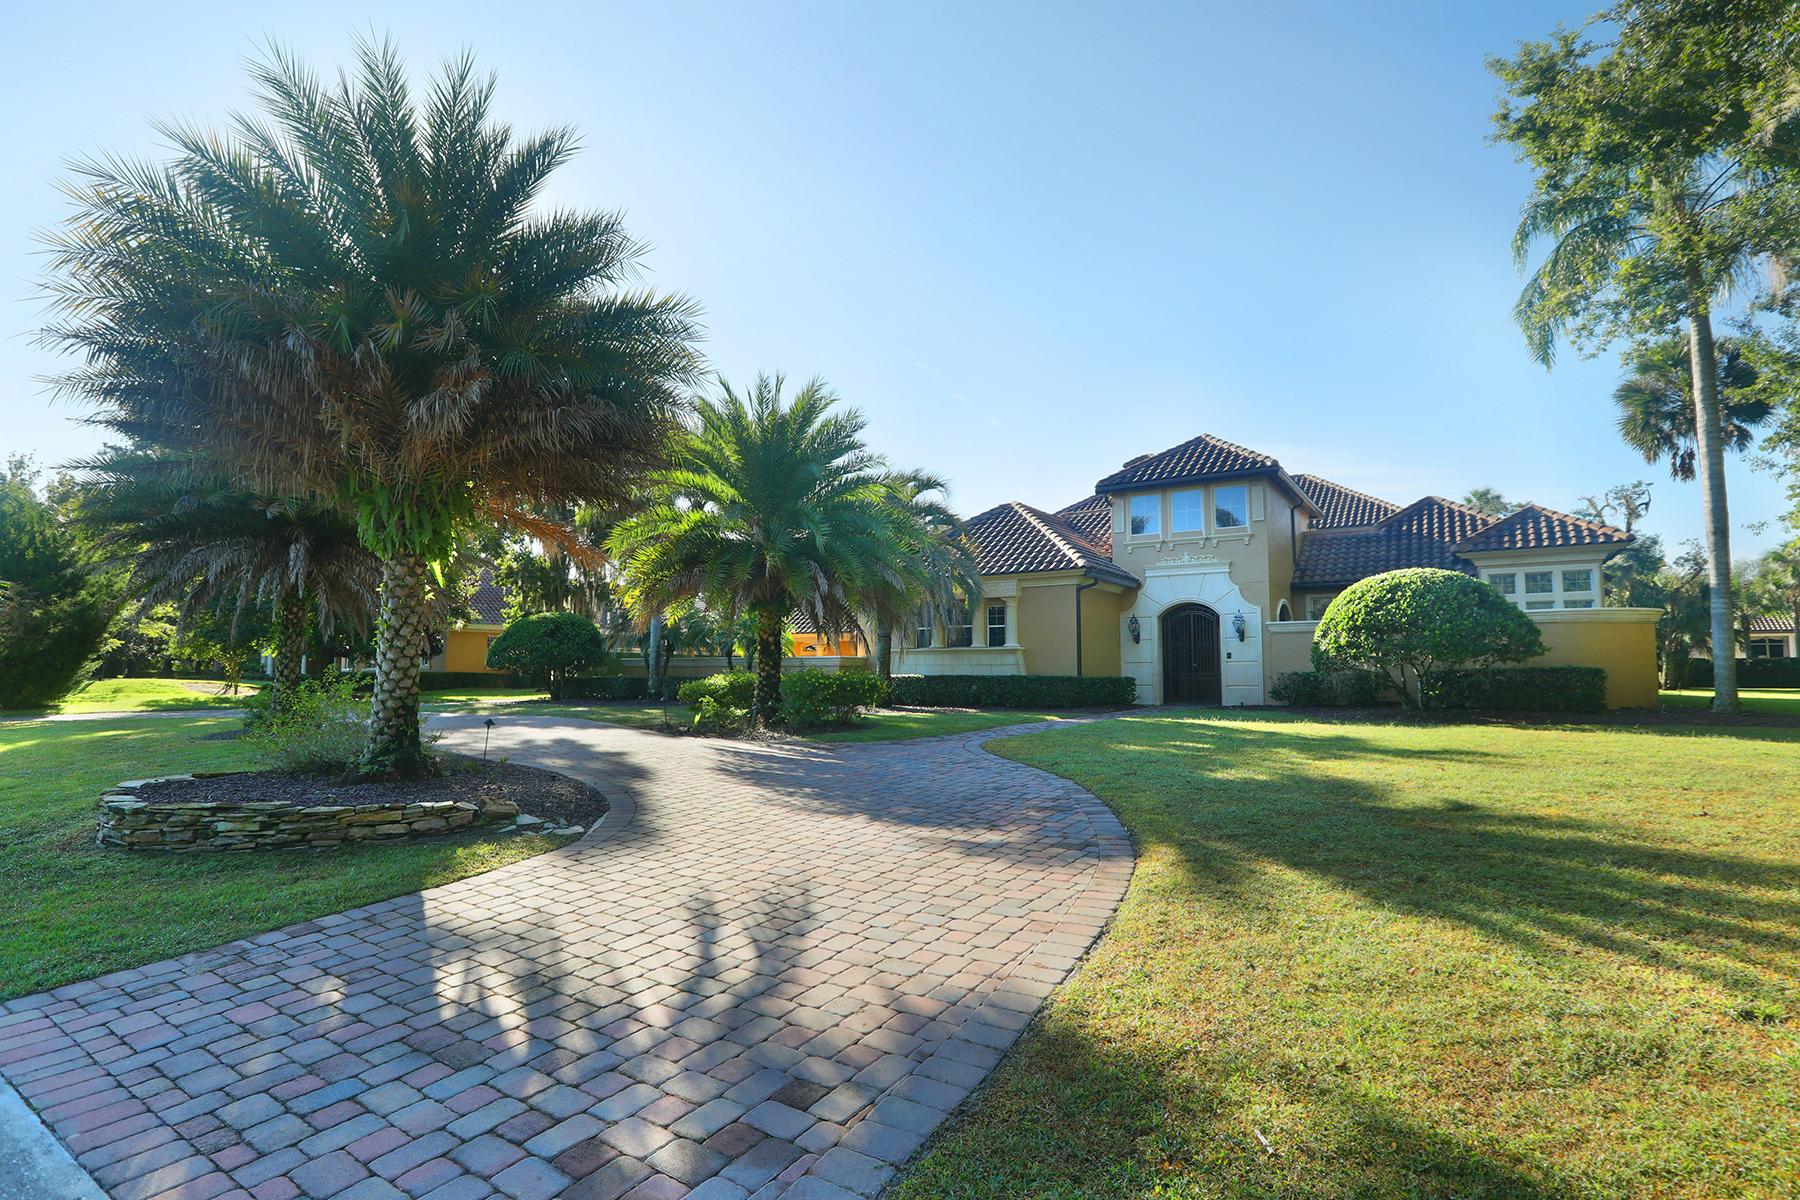 Single Family Homes for Sale at LAKE MARY-ORLANDO 225 Shiloh Cv Lake Mary, Florida 32746 United States